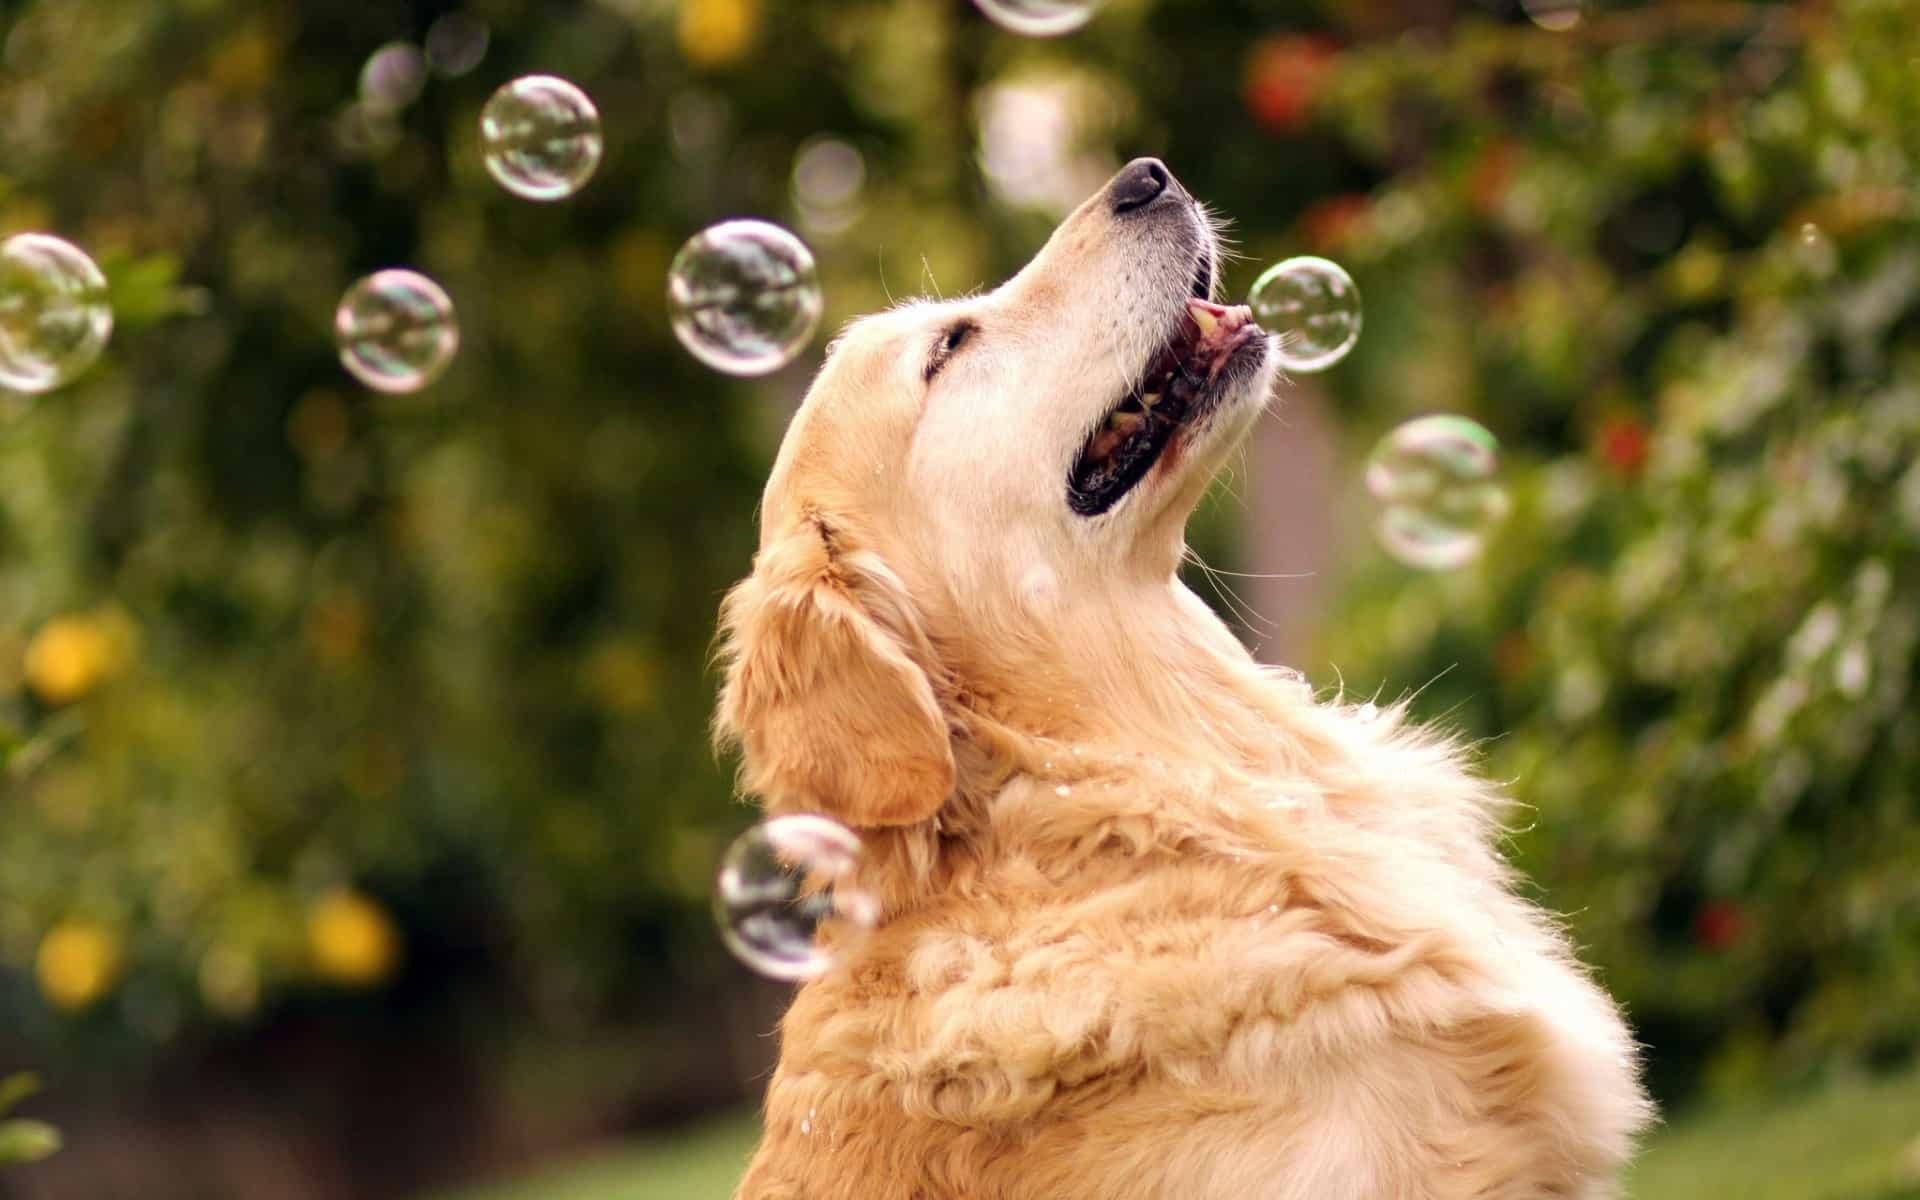 mua chó golden retriever ở hà nội